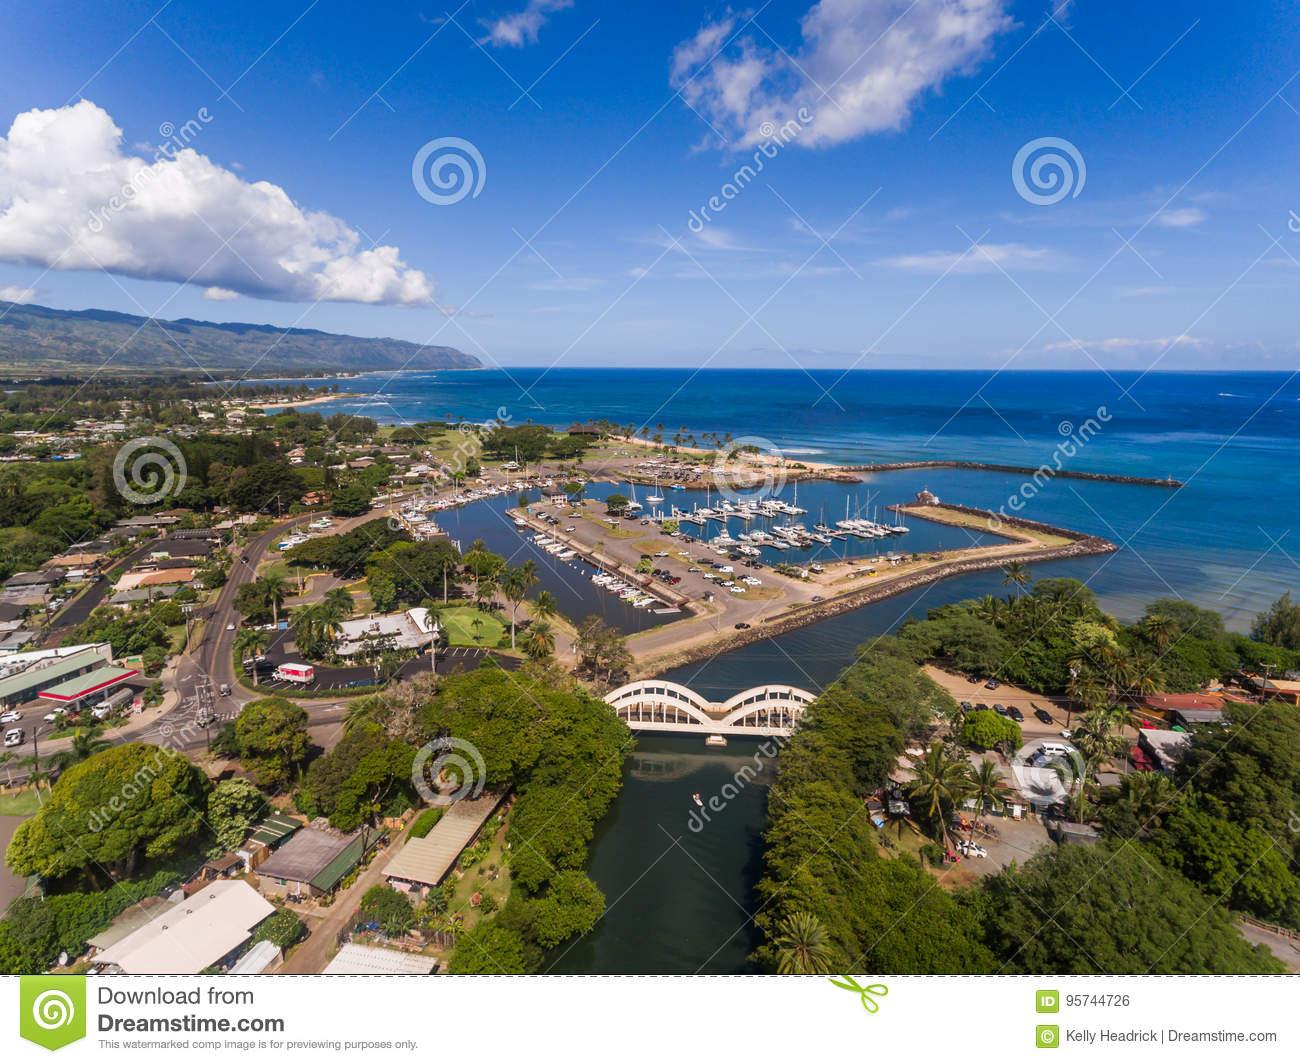 Name:  aerial-view-haleiwa-town-harbor-small-boat-anahulu-river-bridge-95744726.jpg Views: 875 Size:  241.9 KB